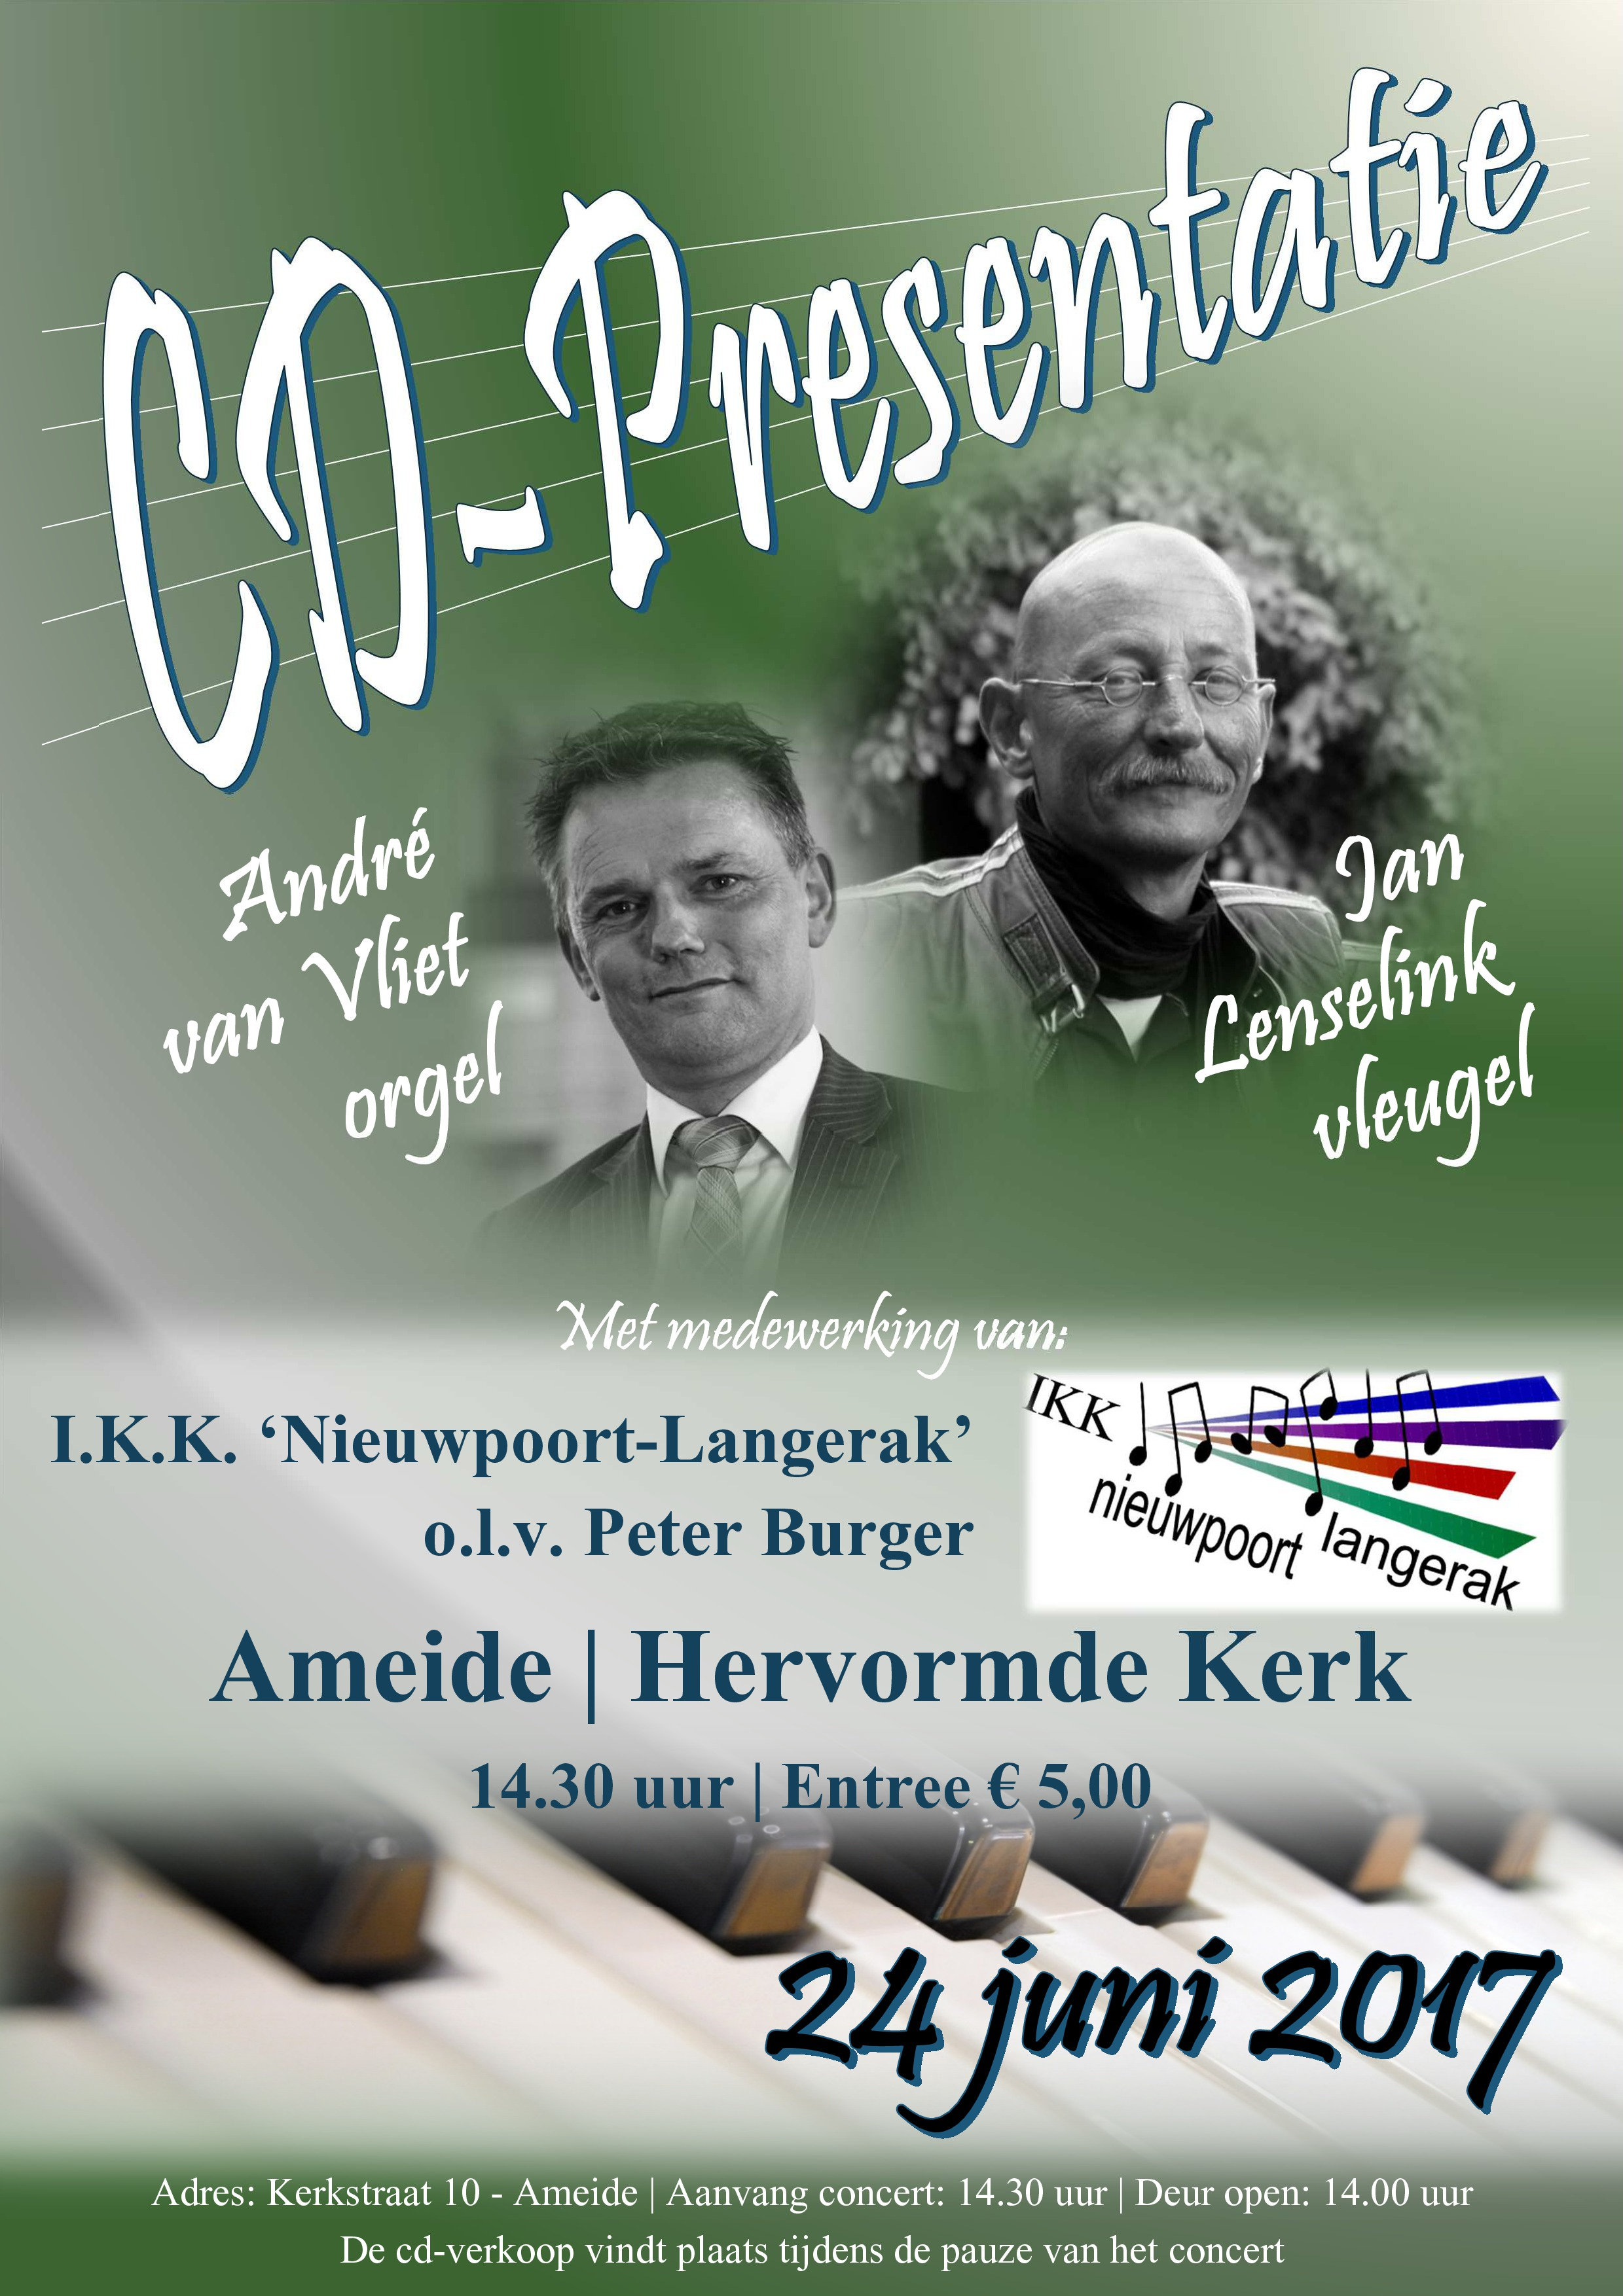 CD-presentatie Ameide